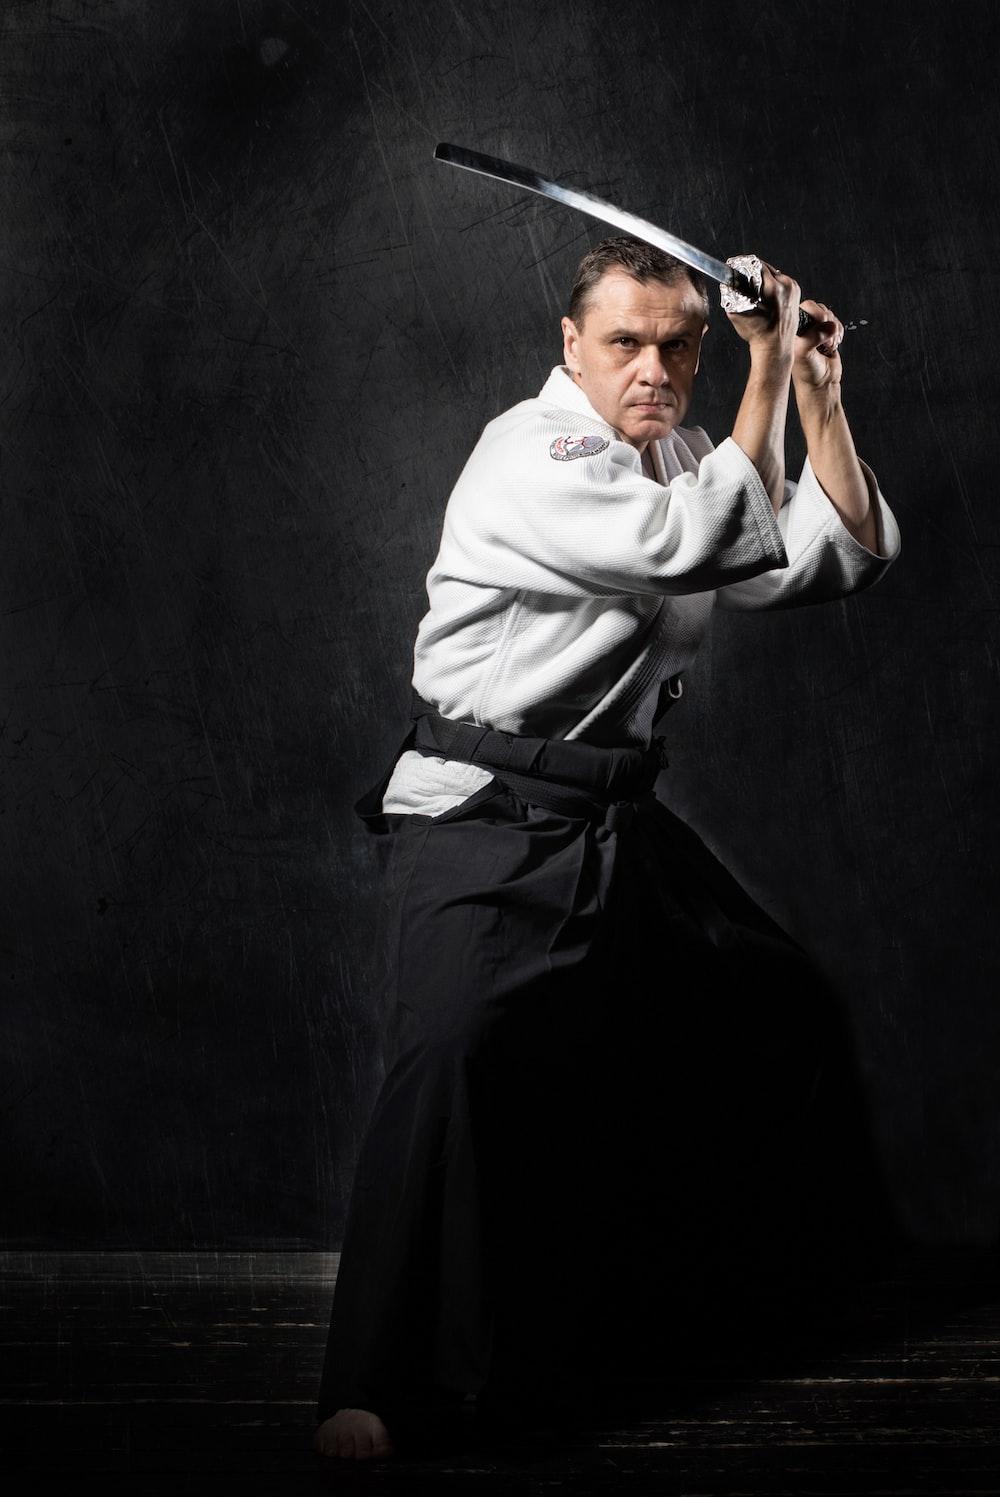 man holding black sword